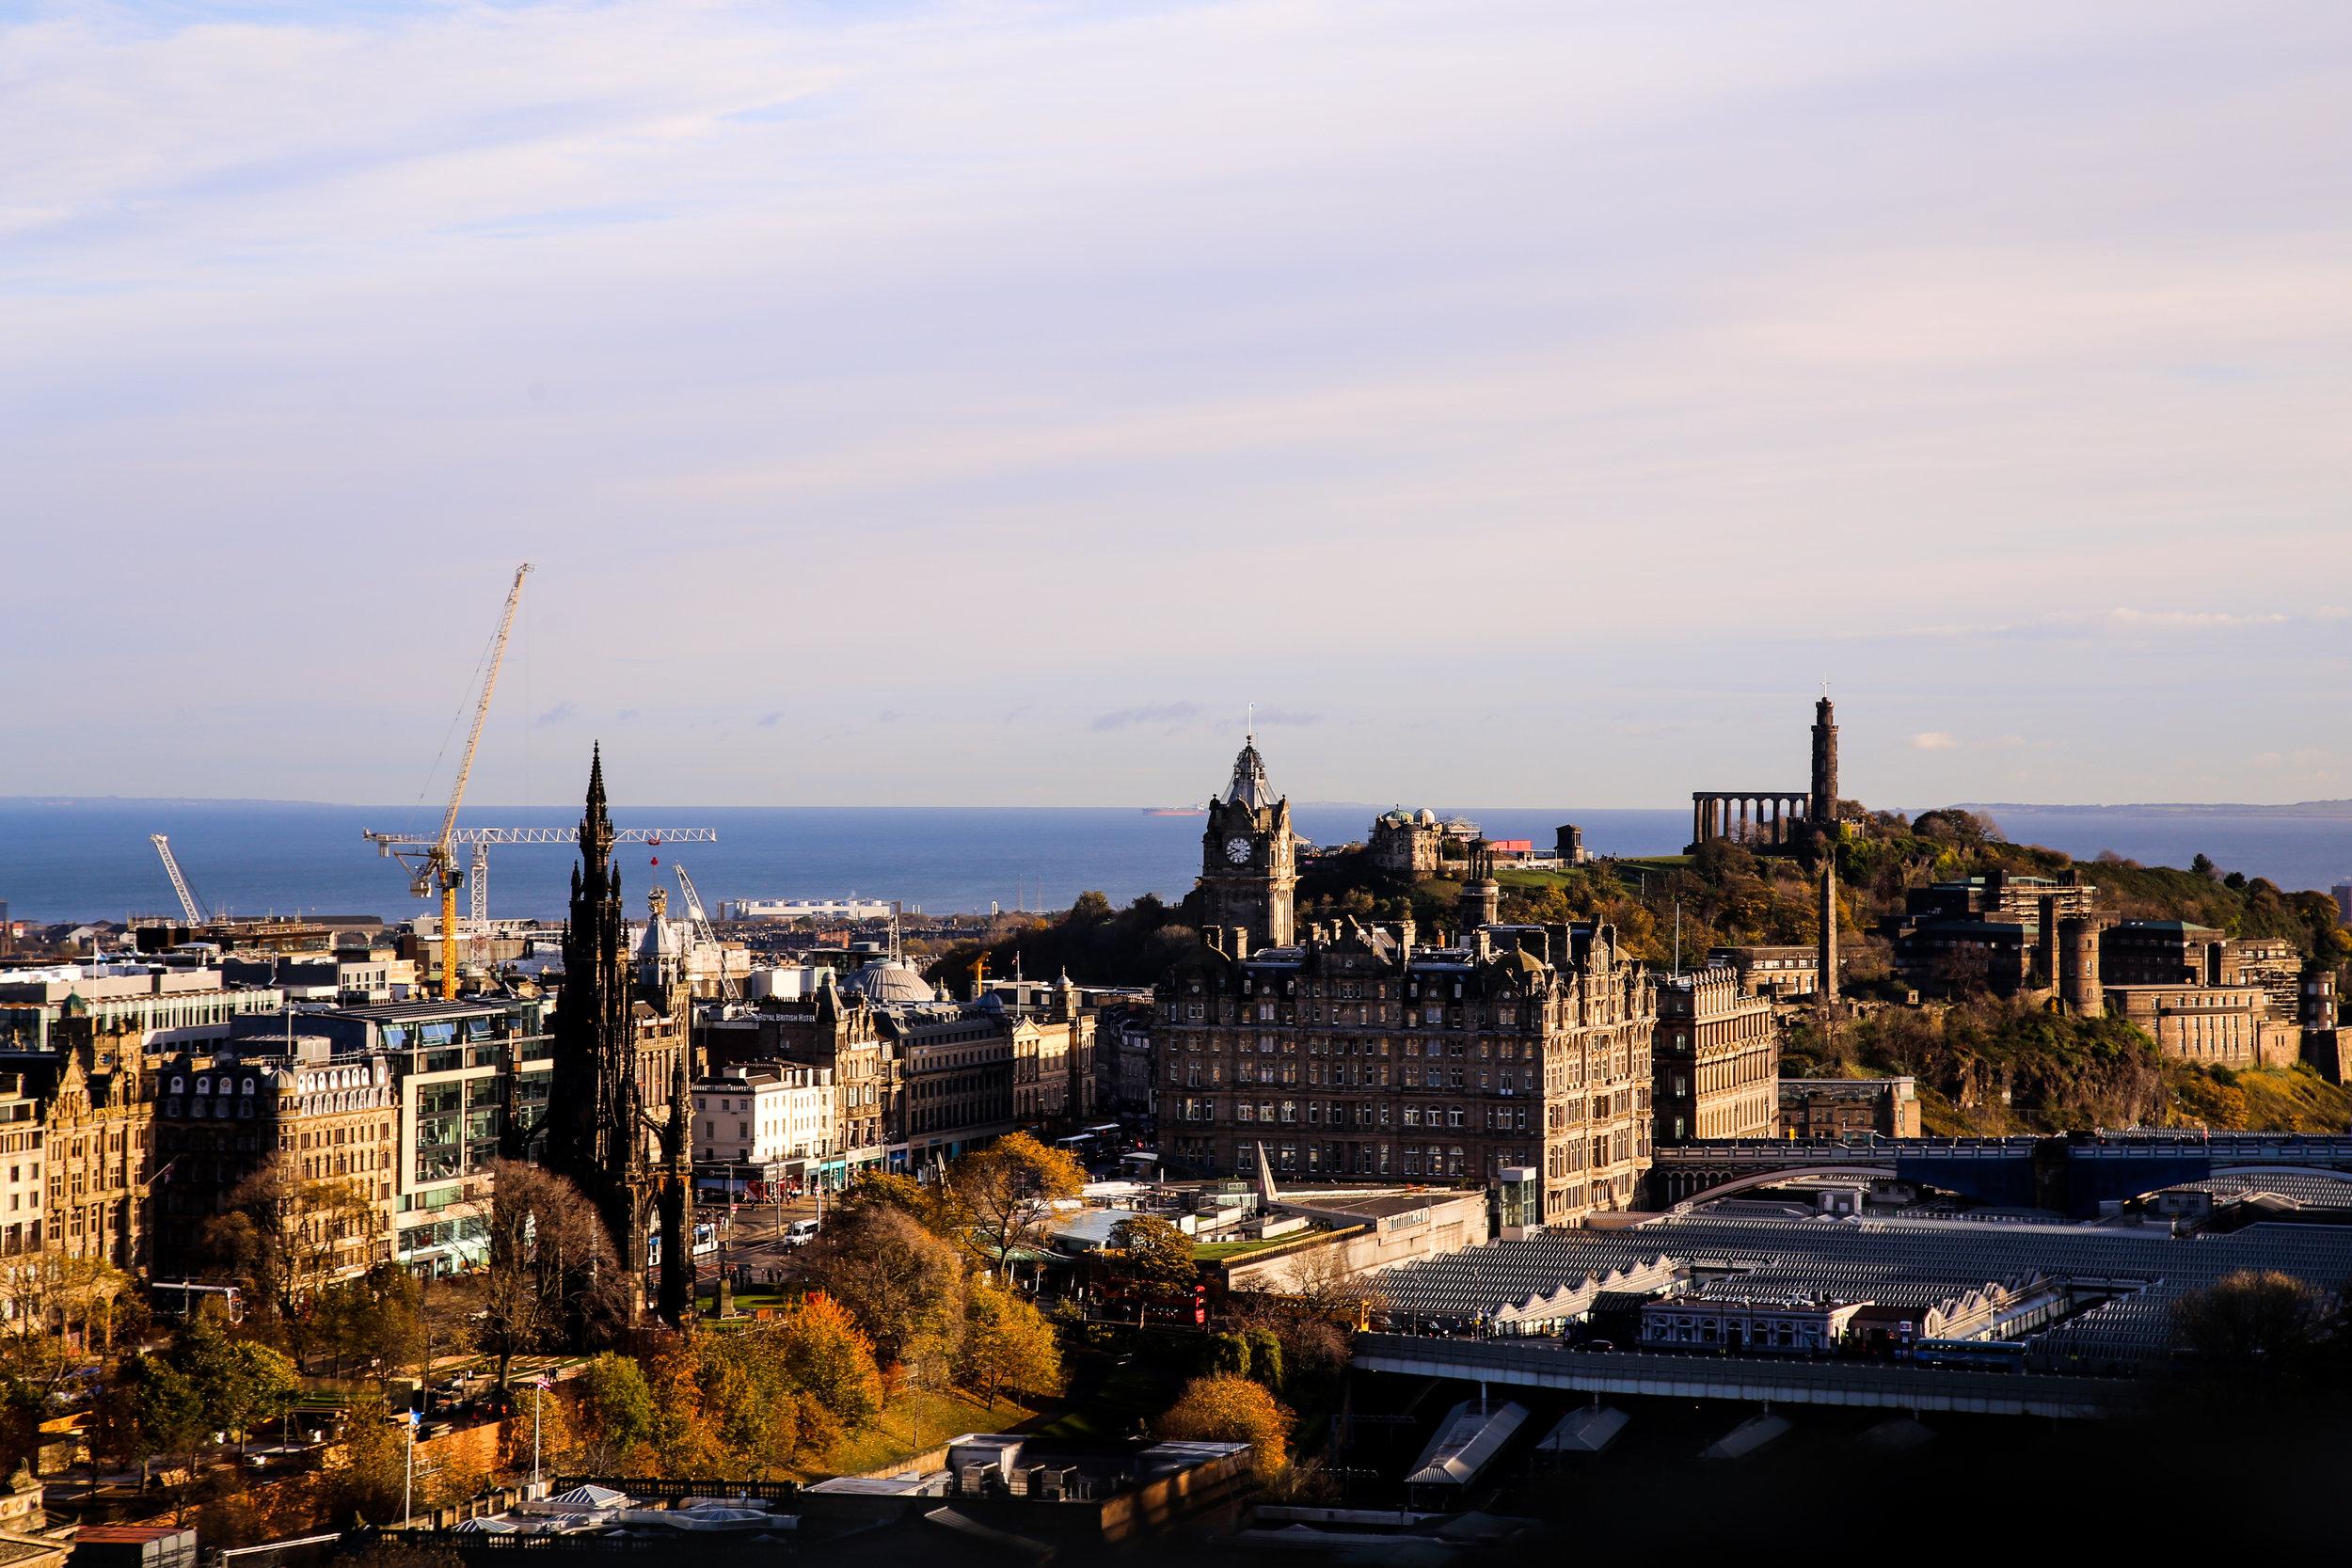 View of Edinburgh overlooking coast